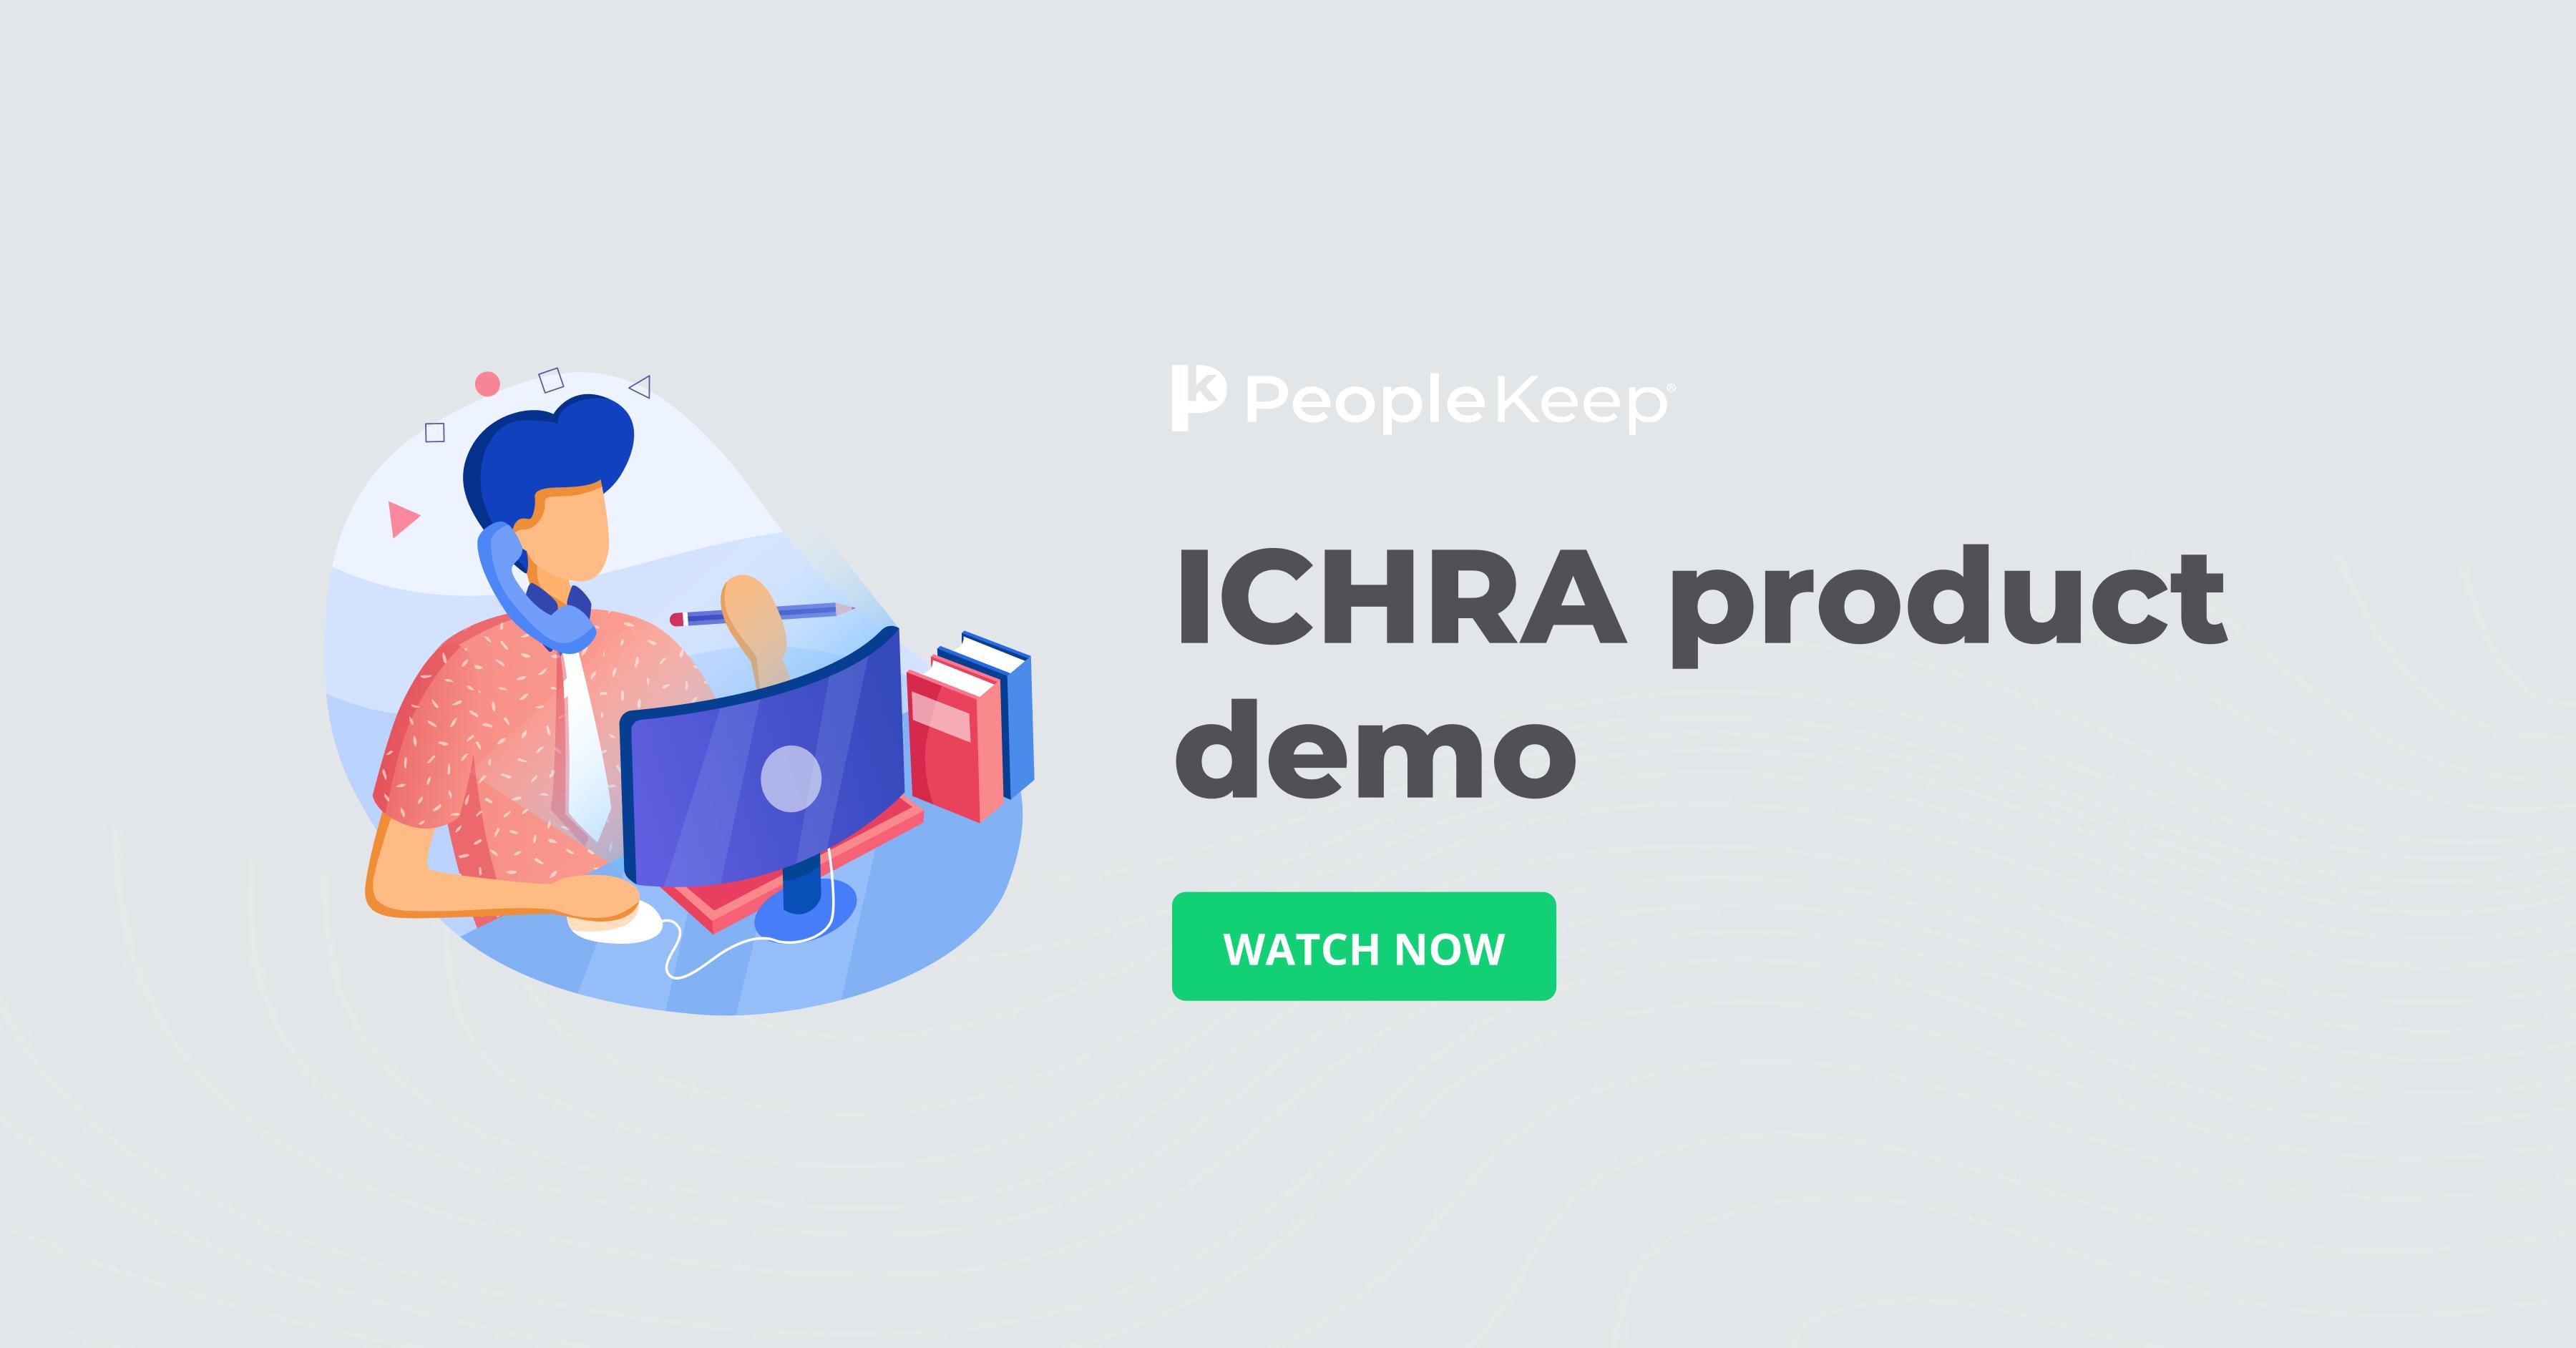 ichra product demo video thumbnail